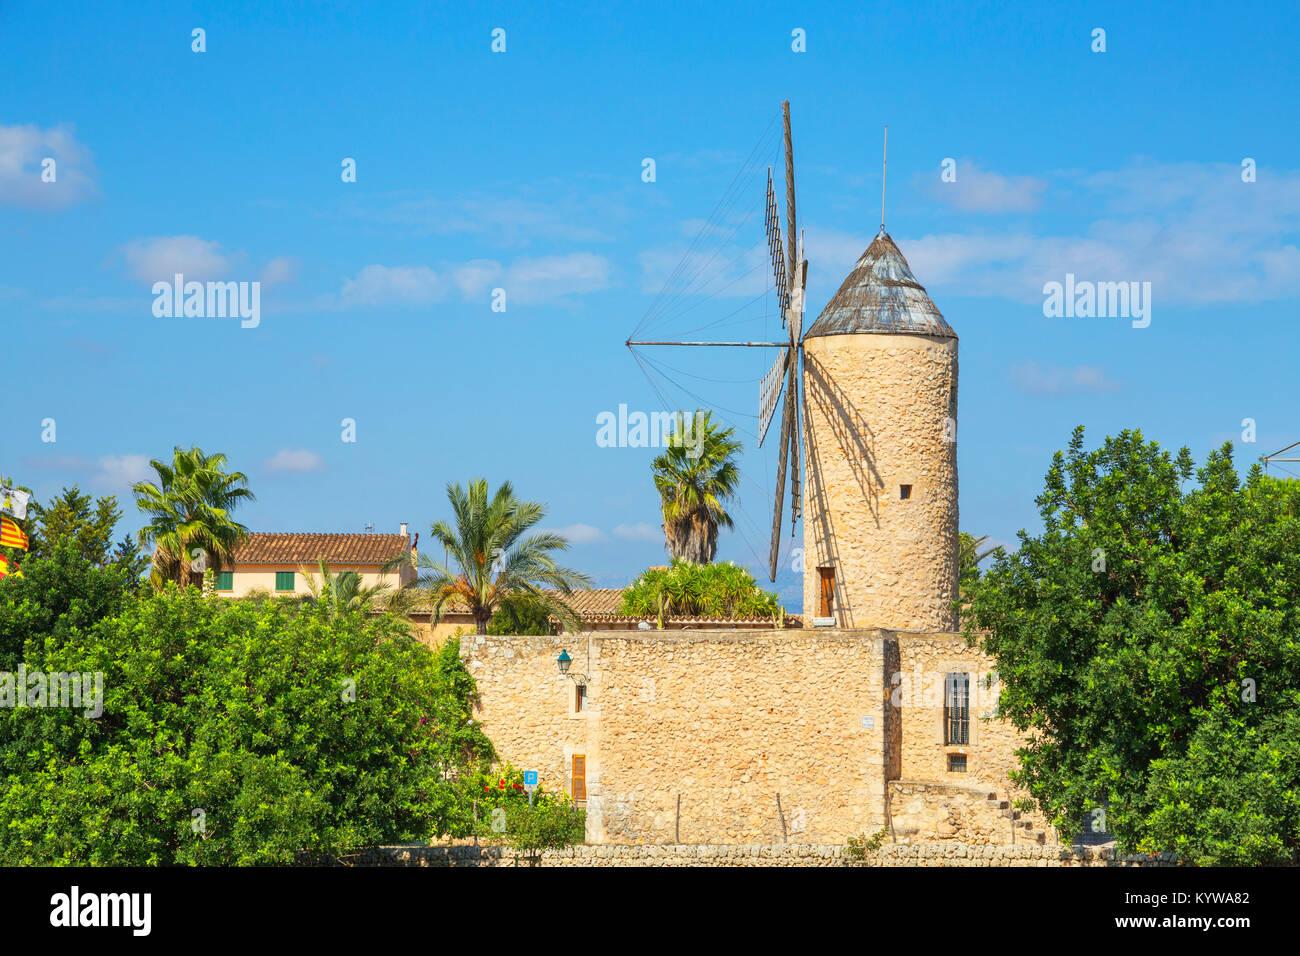 Moulin à Sineu, Majorque, Iles Baléares, Espagne, Europe Photo Stock